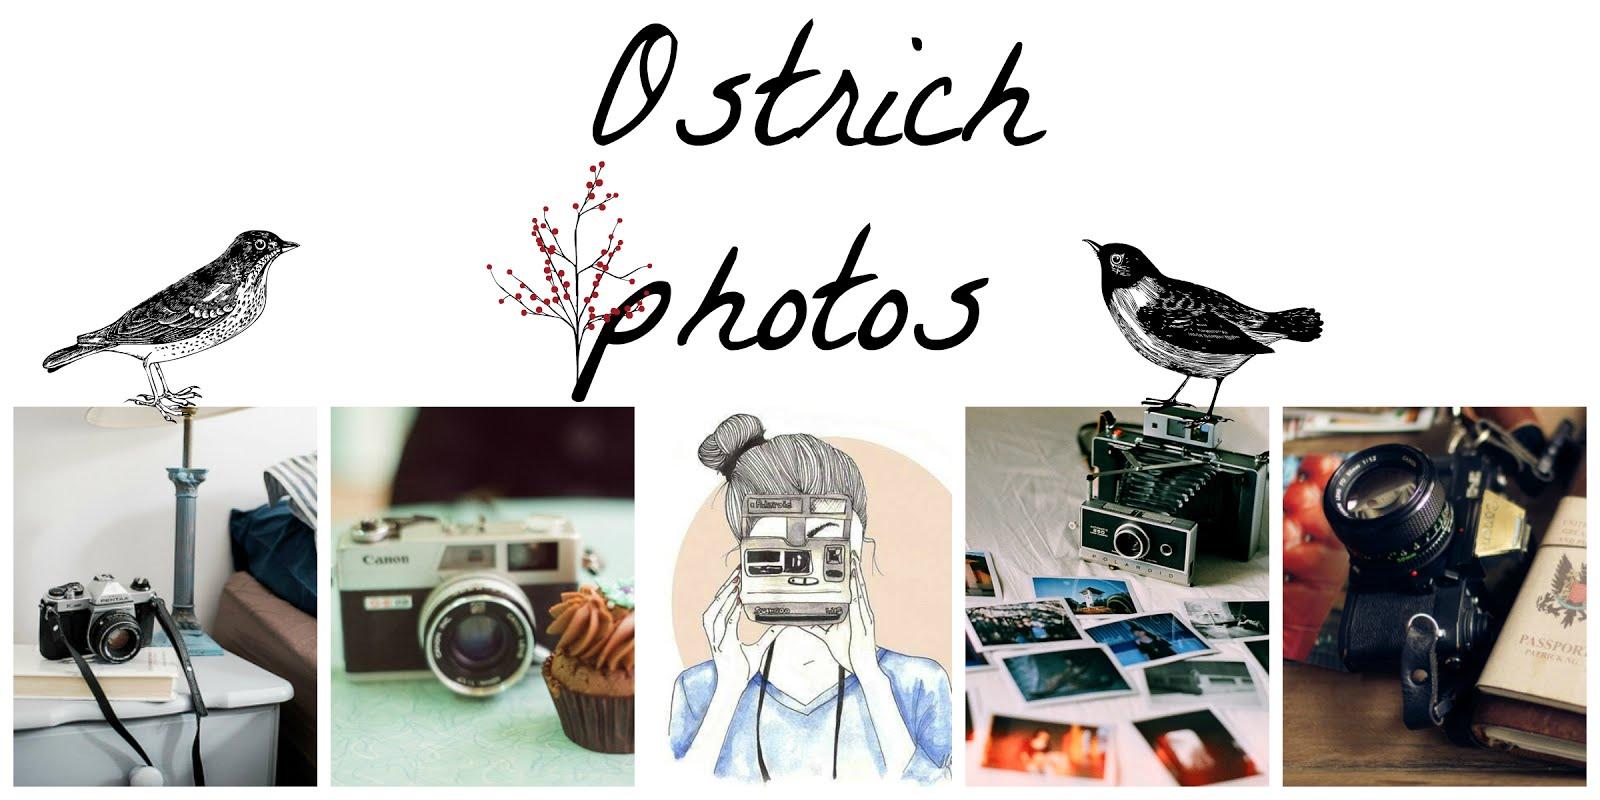 Ostrich photos